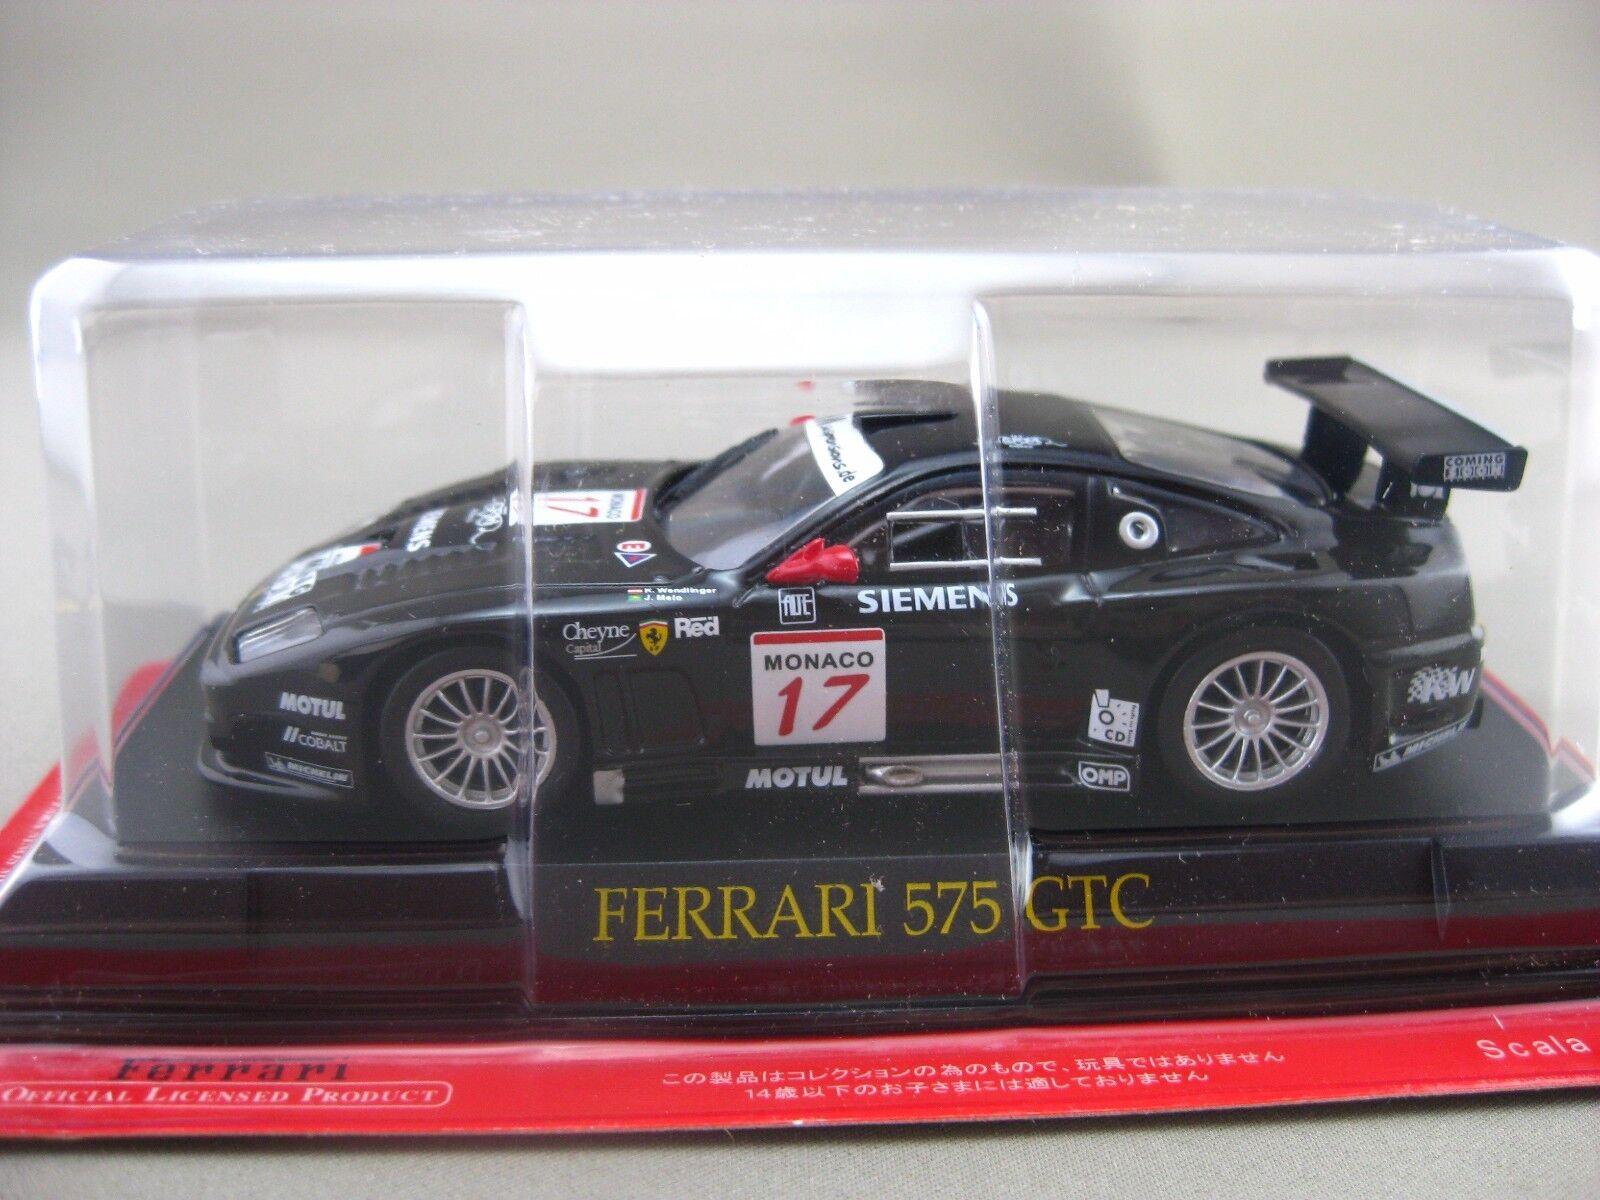 FERRARI 575 GTC Hachette 1 43 Diecast voiture Vol.75